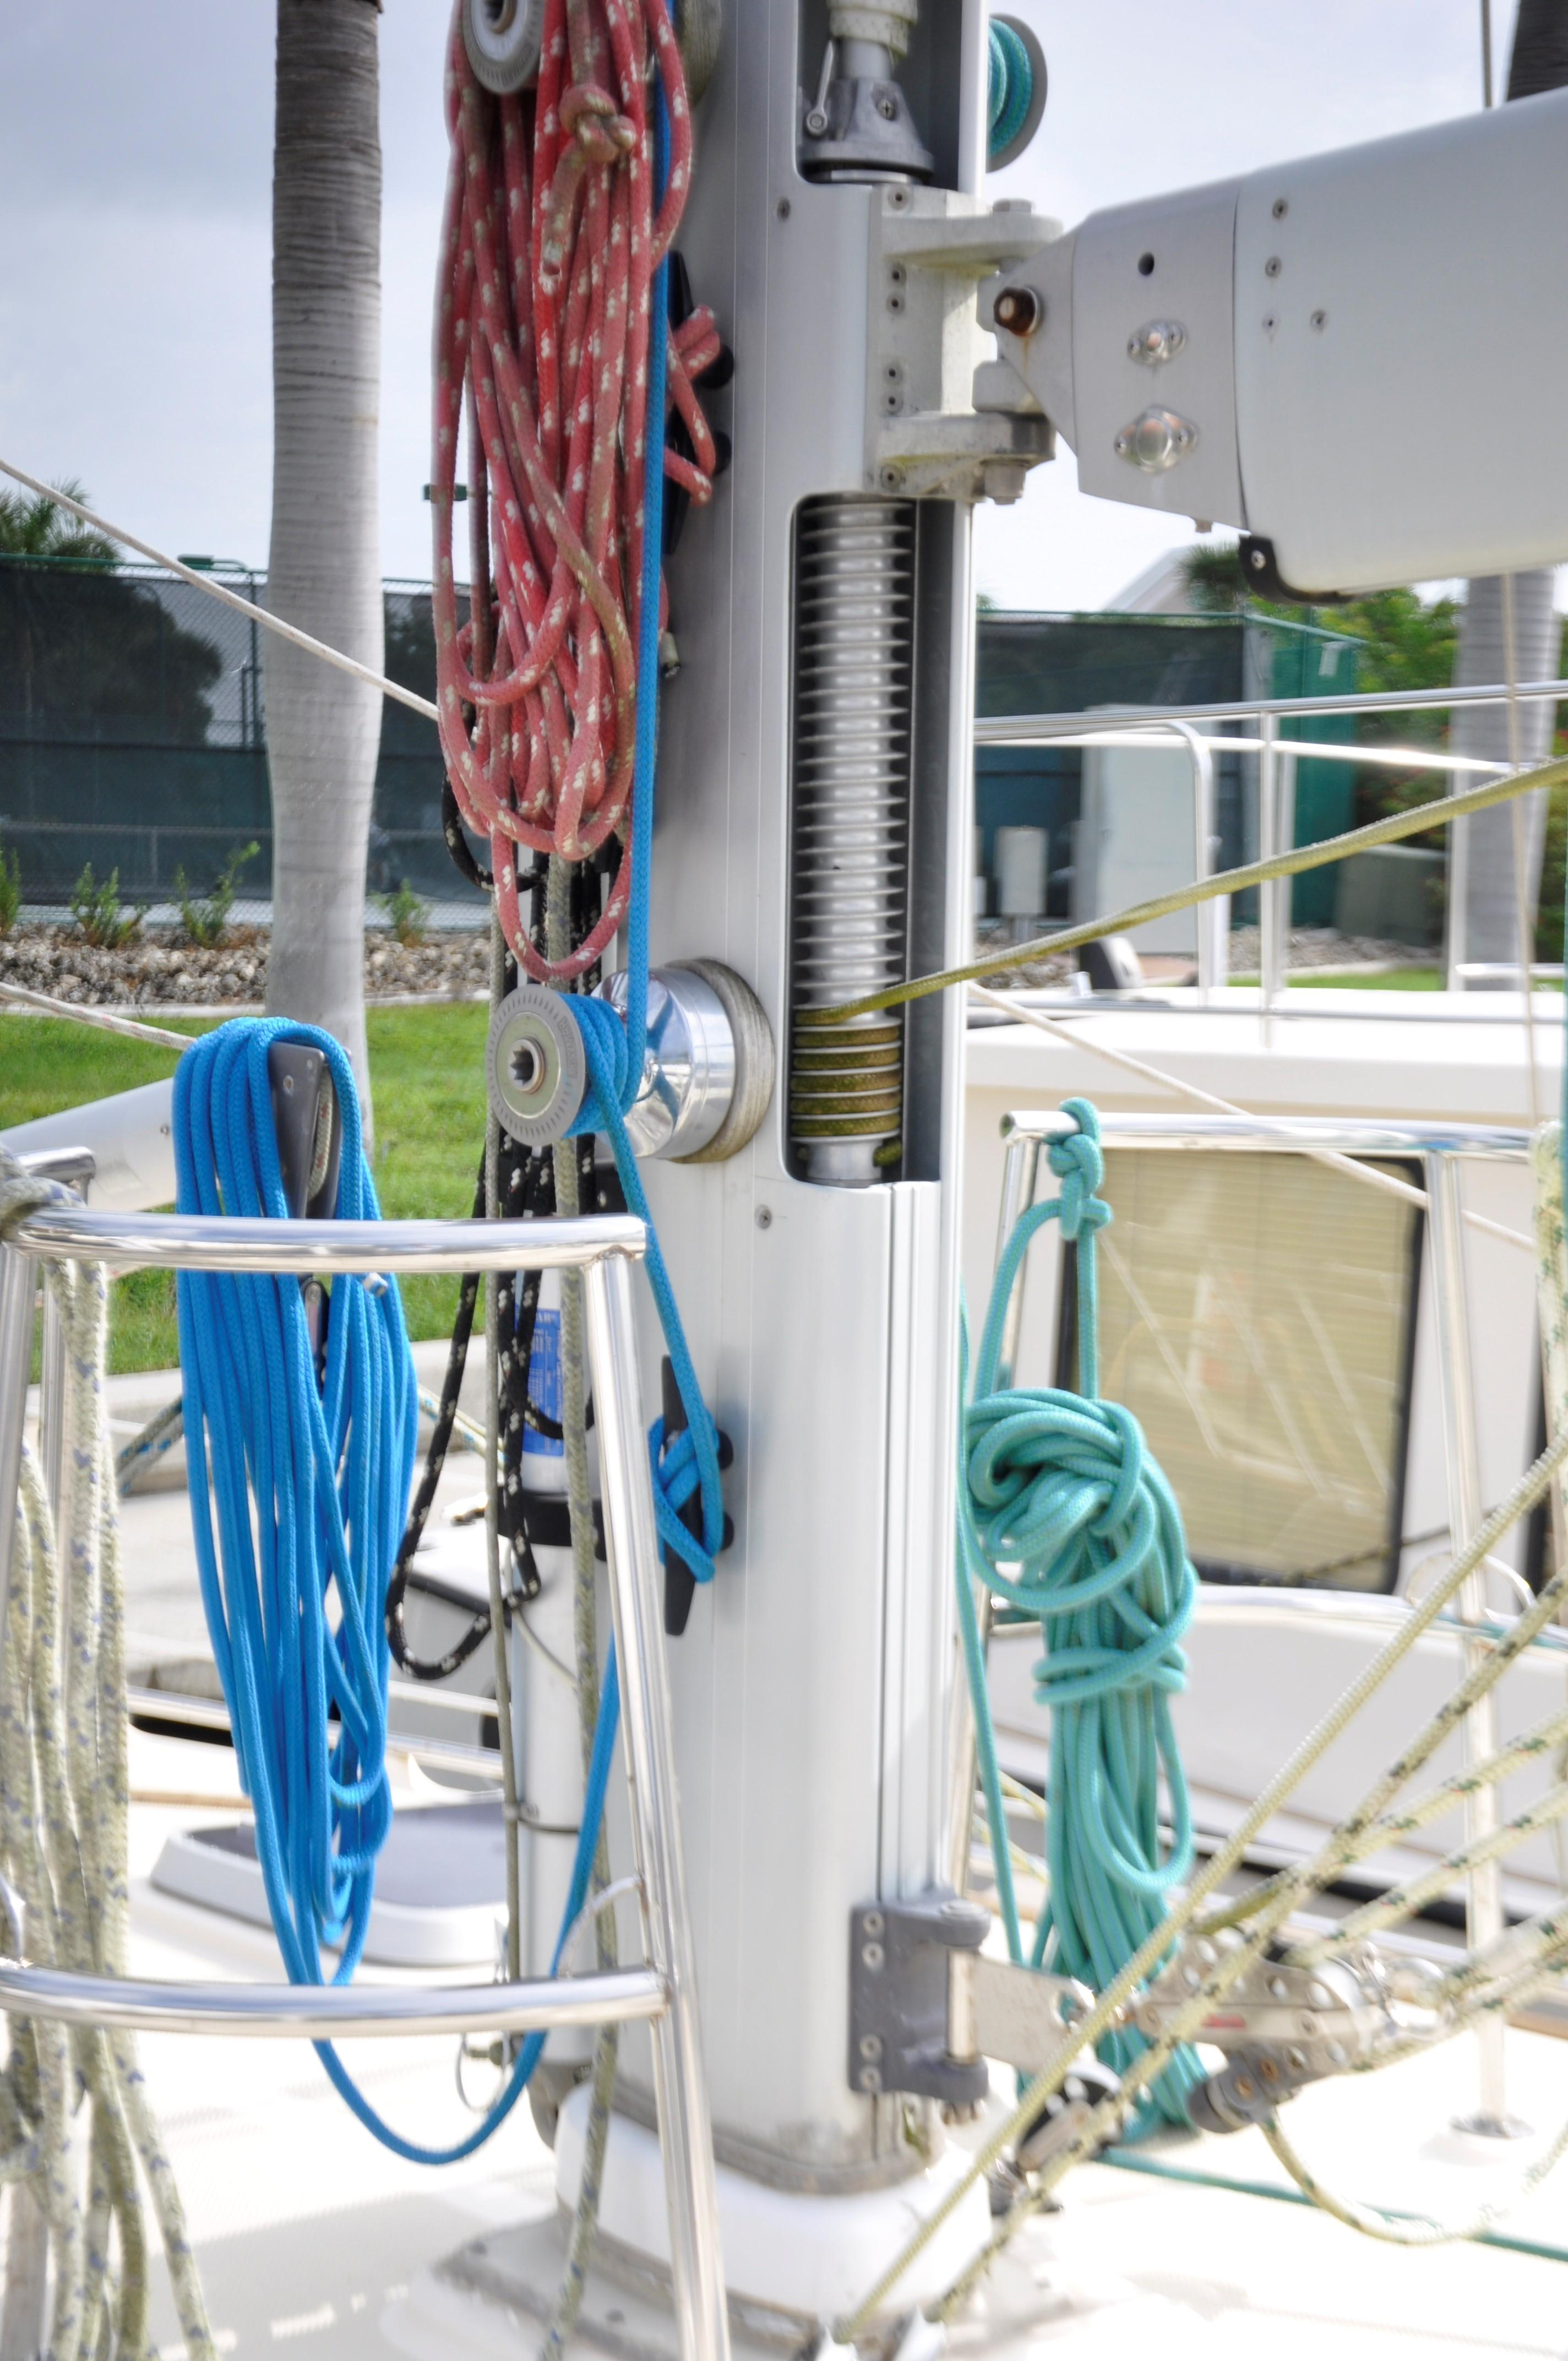 Roller furling mast